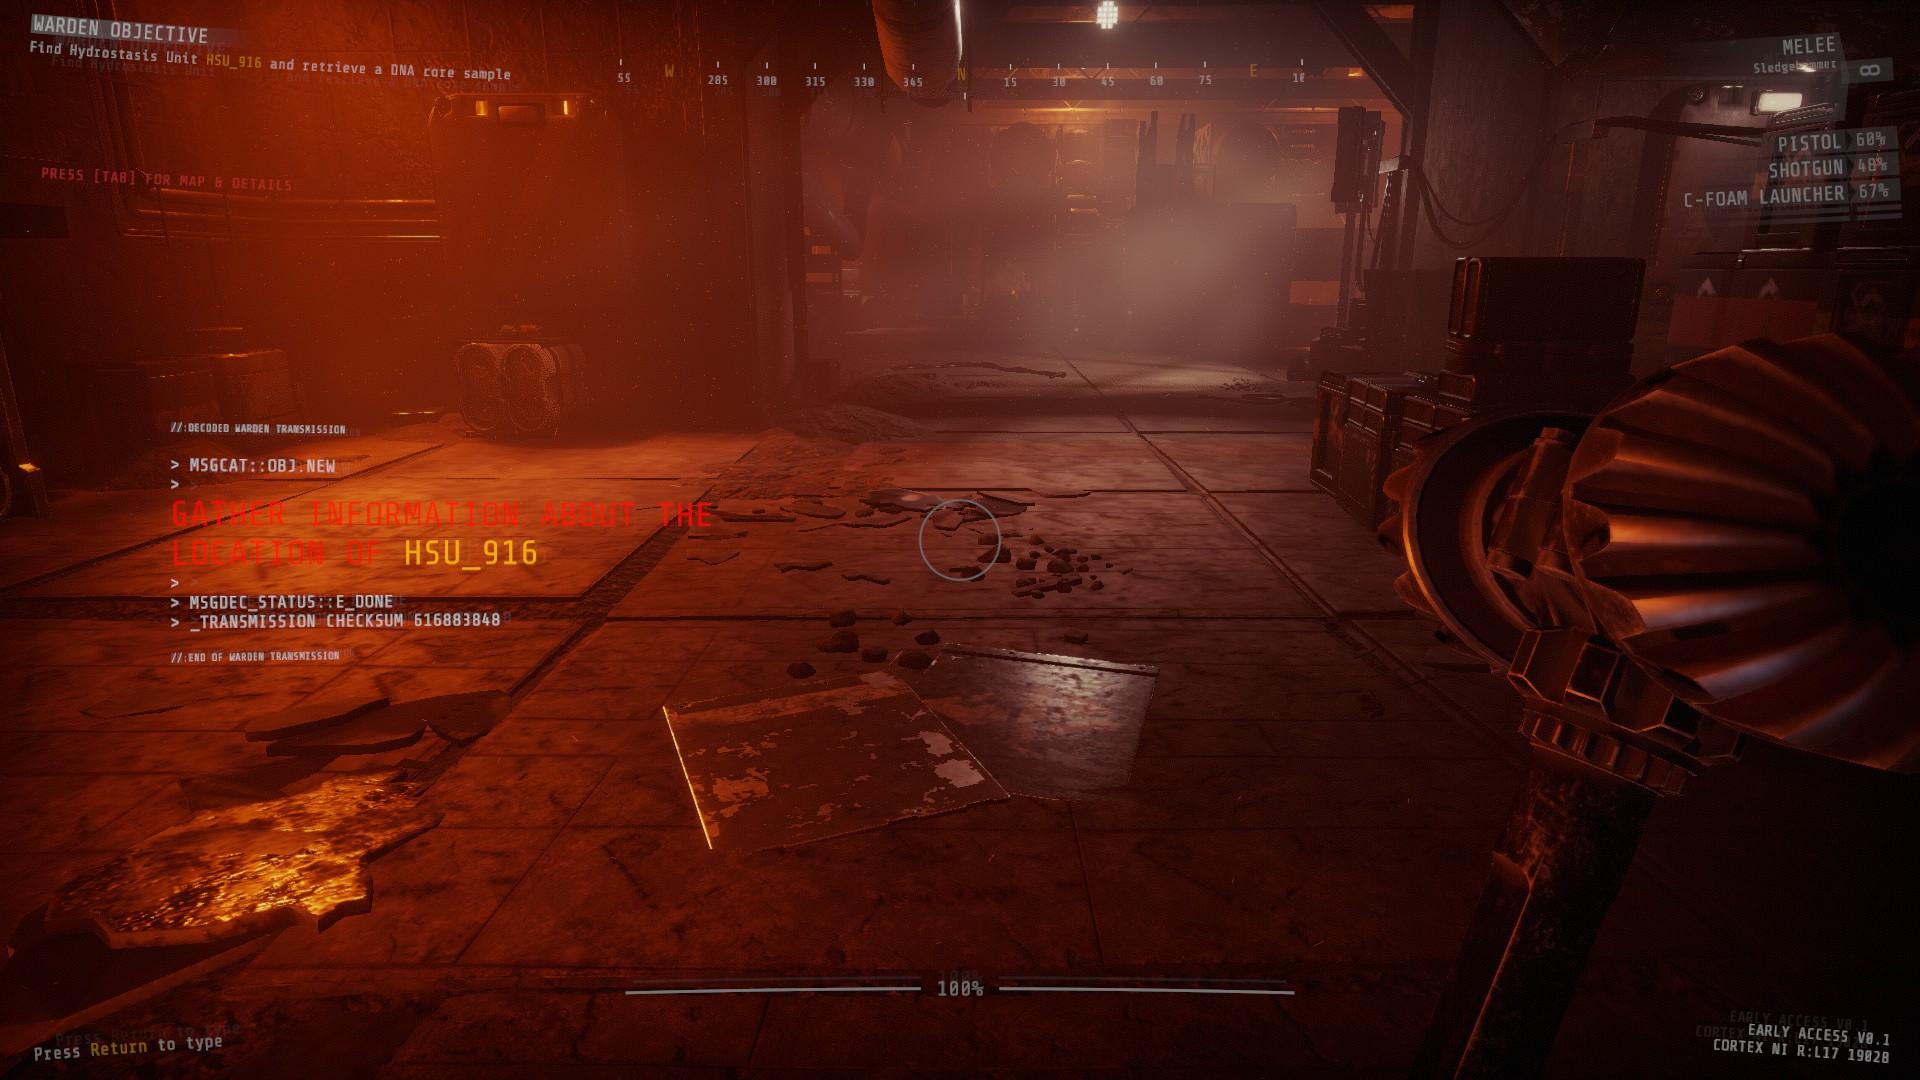 [PCゲーム]GTFO早期アクセス、そうだ、地下施設を調べにいこう。3